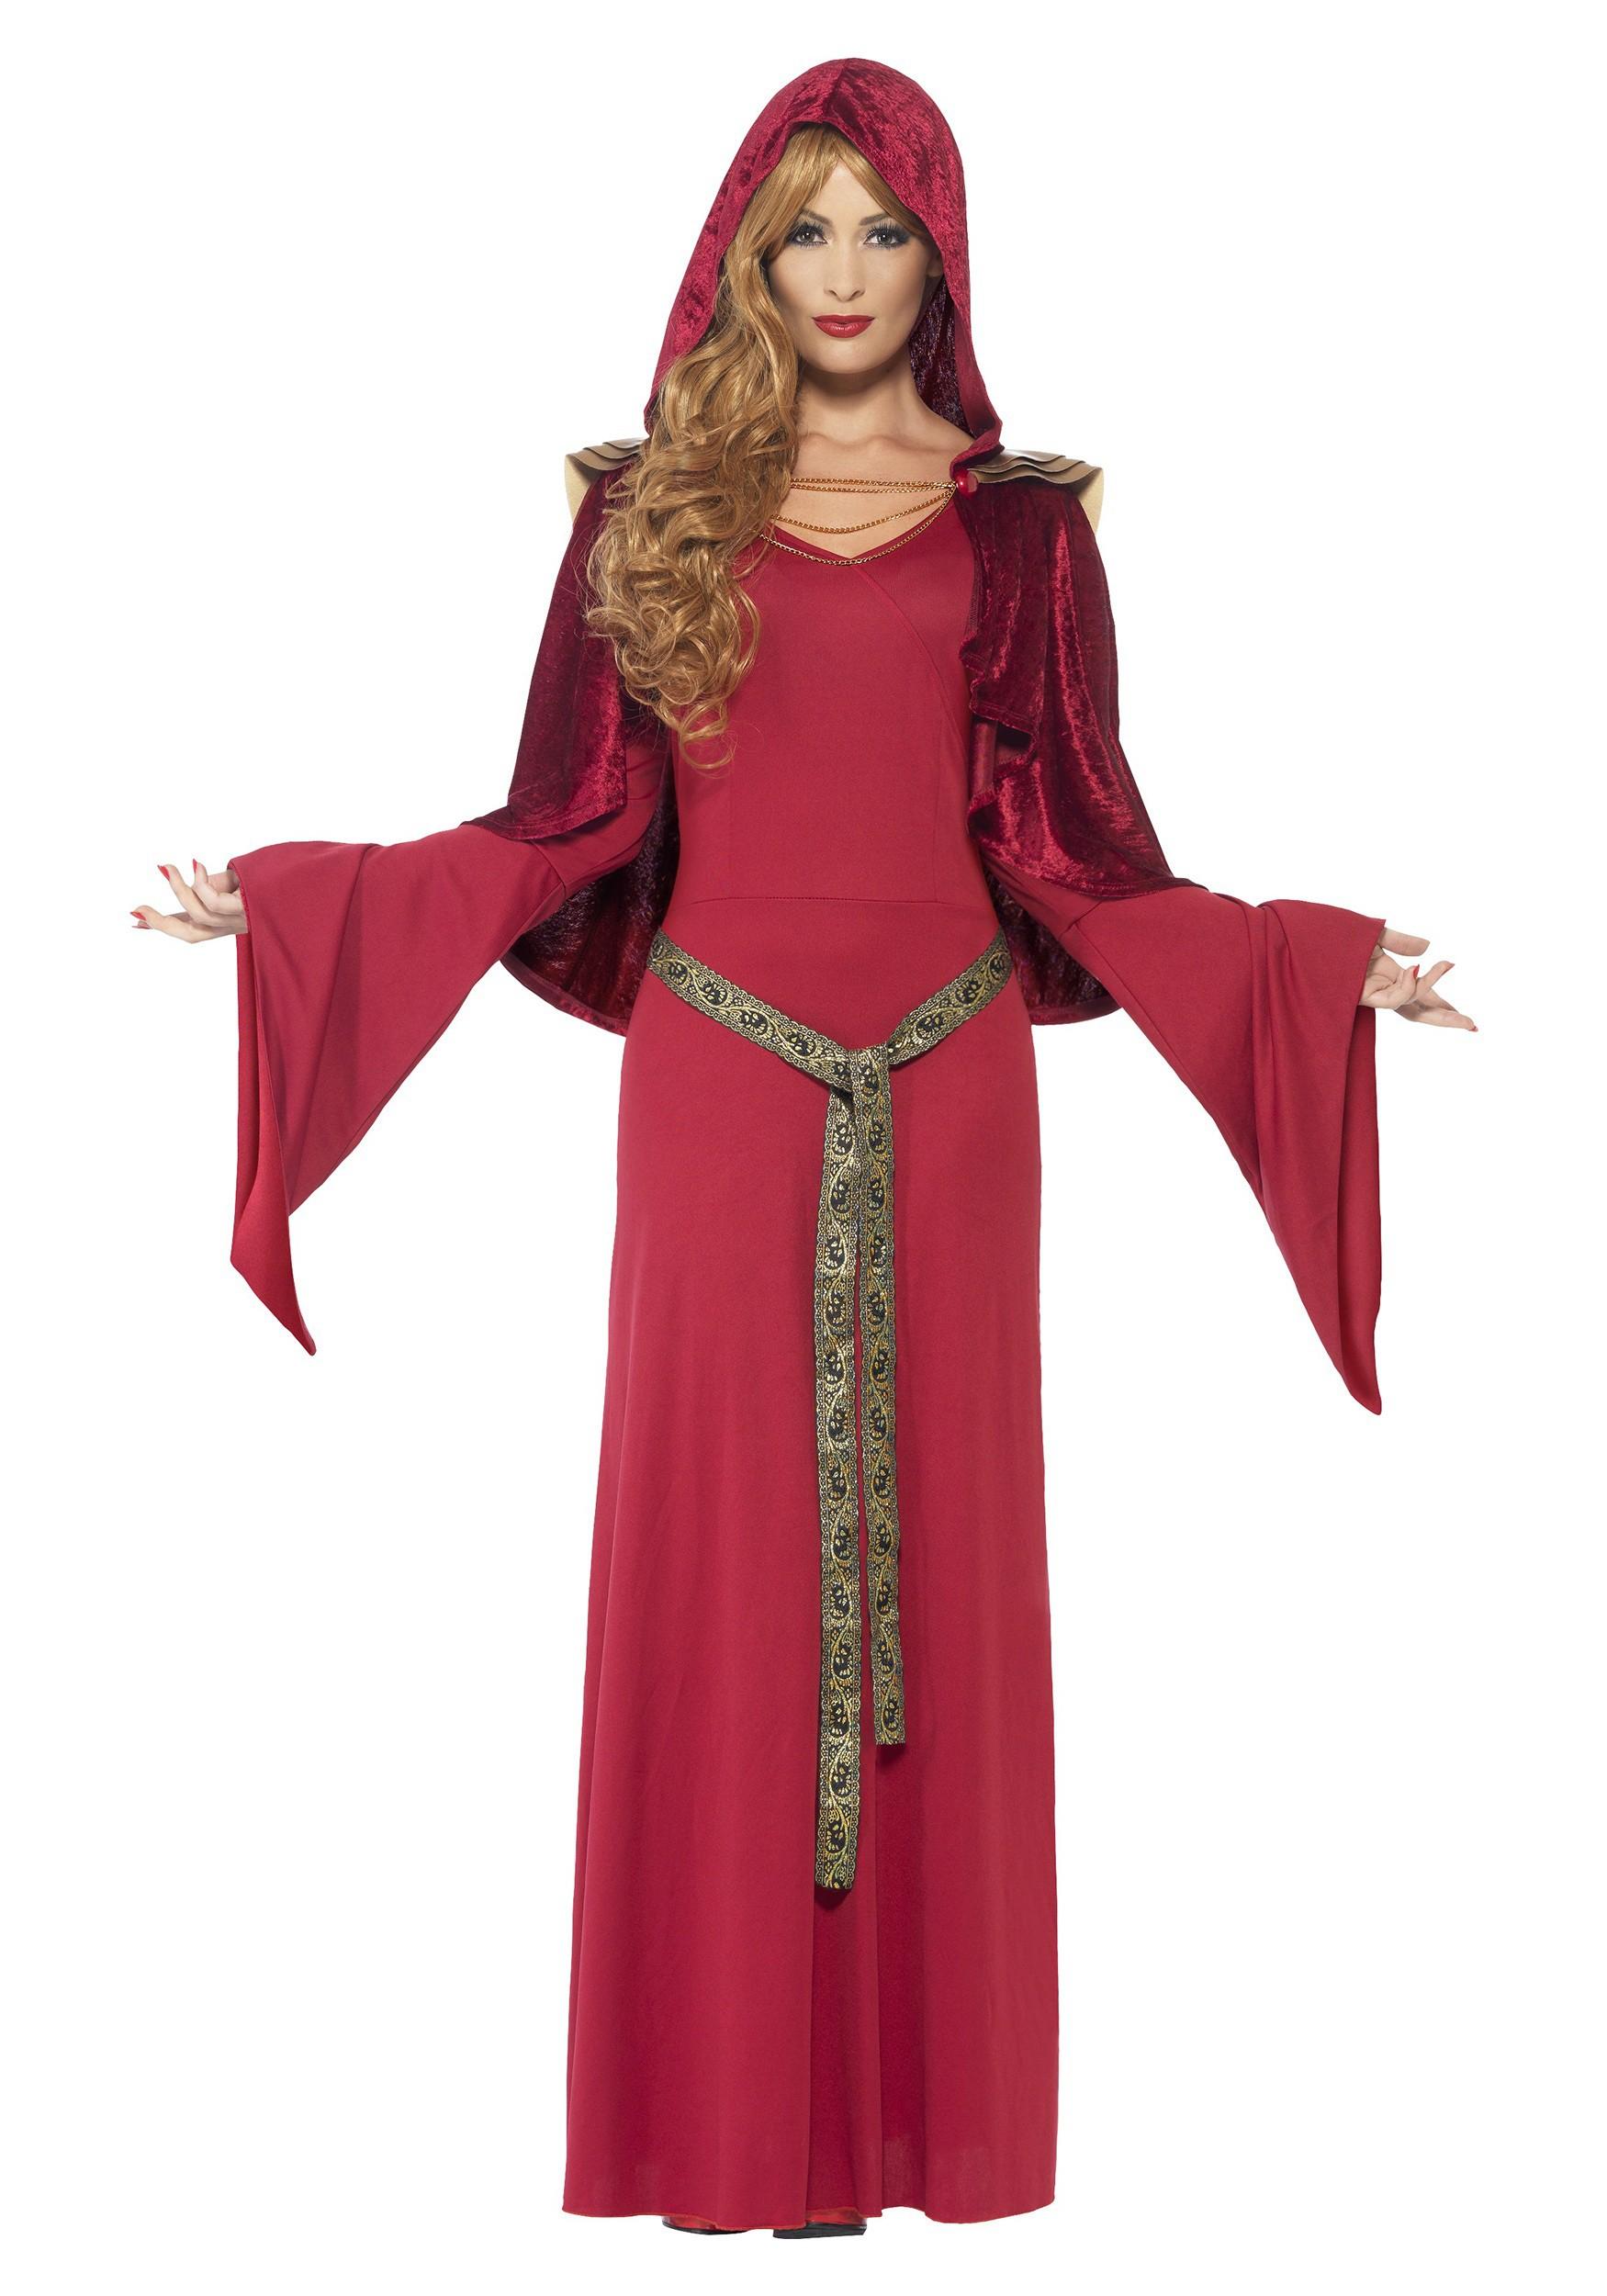 Red High Priestess Women's Costume